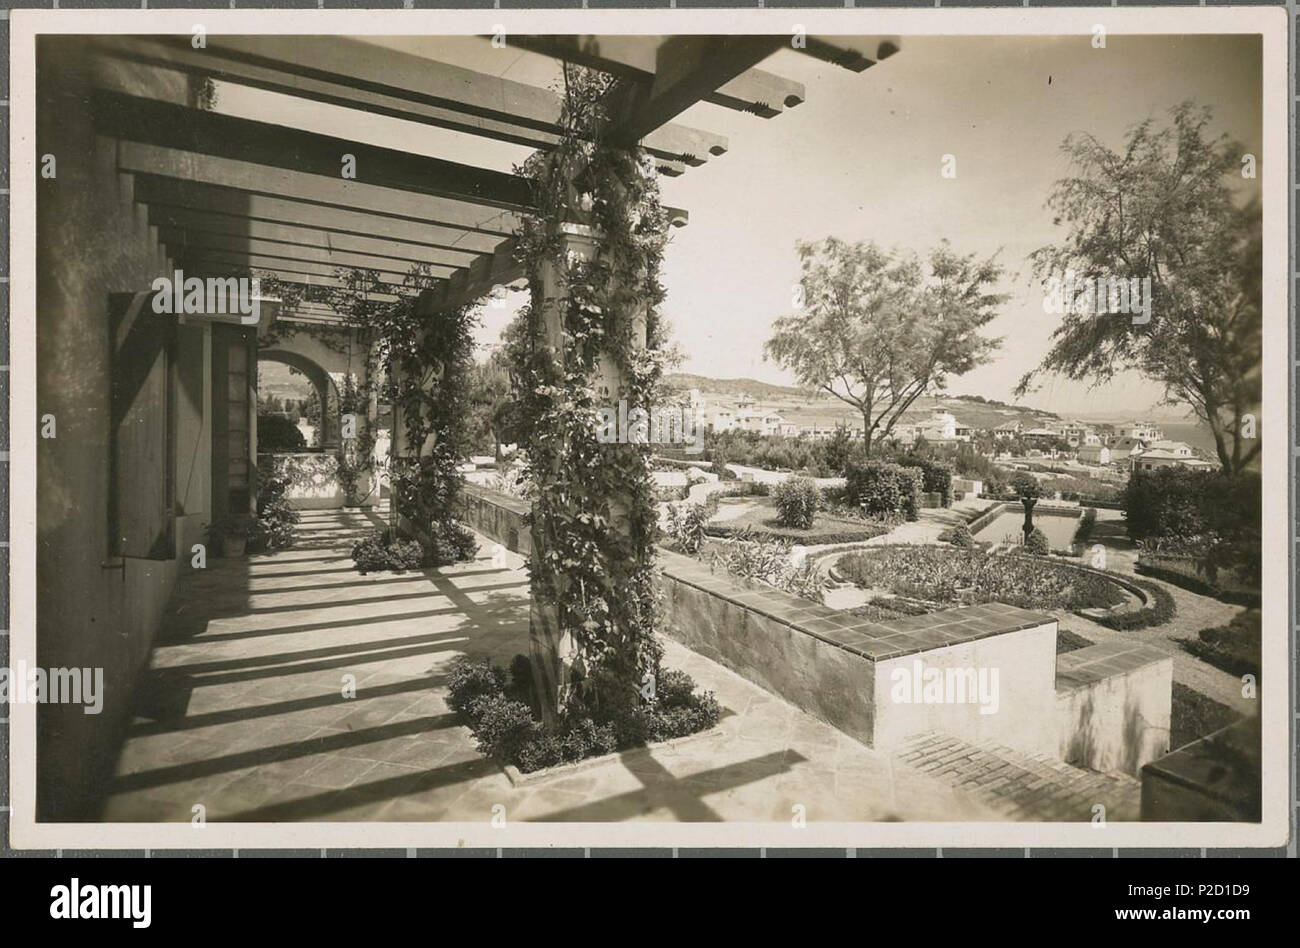 1932 1939 Stock Photos & 1932 1939 Stock Images - Alamy